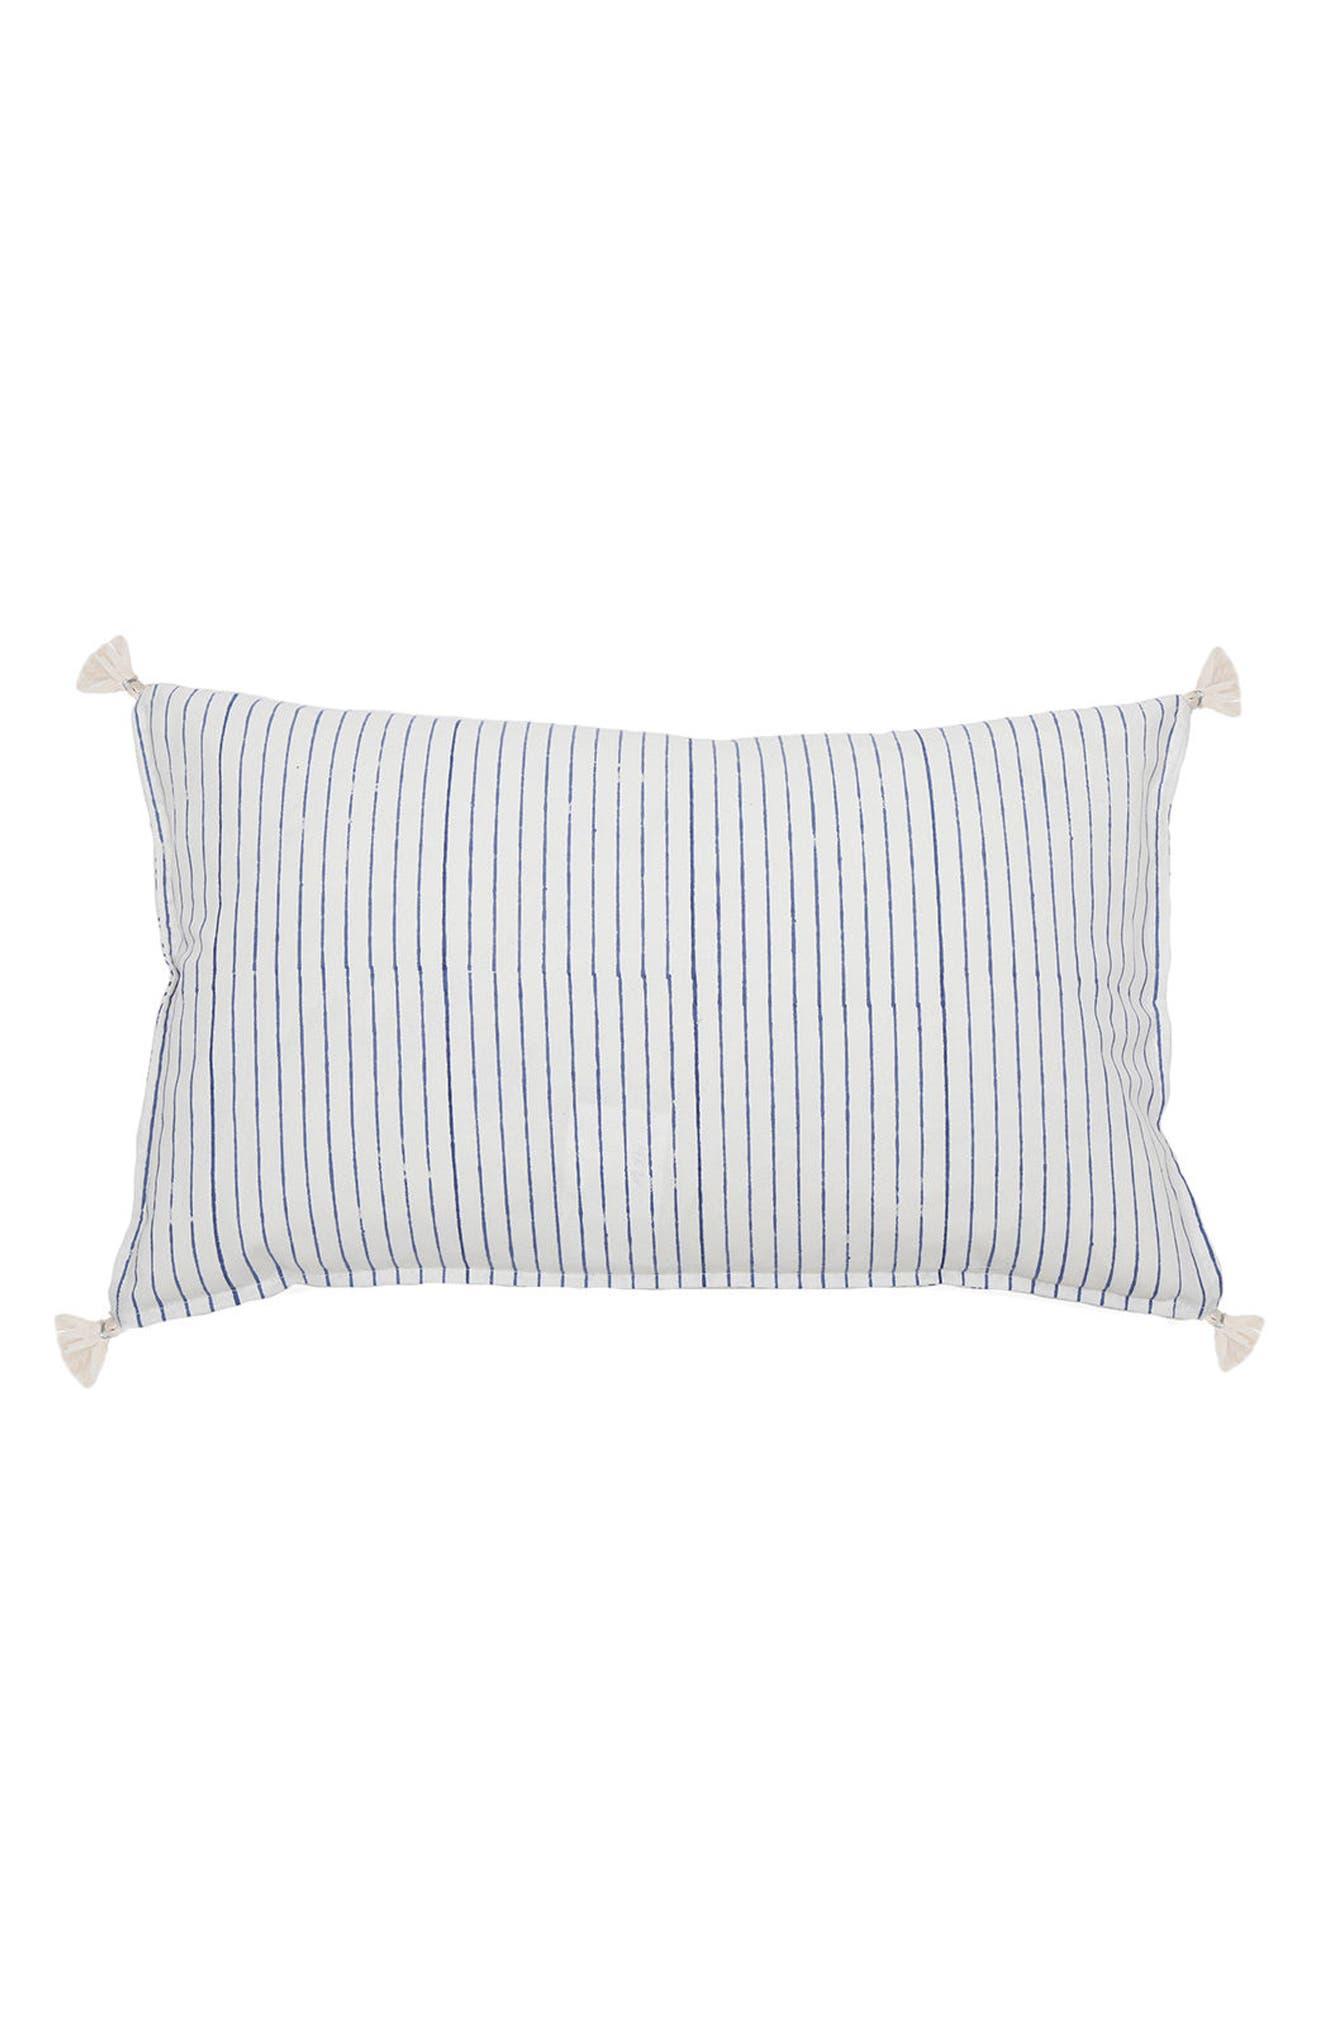 Alternate Image 2  - Pom Pom at Home Dali Accent Pillow